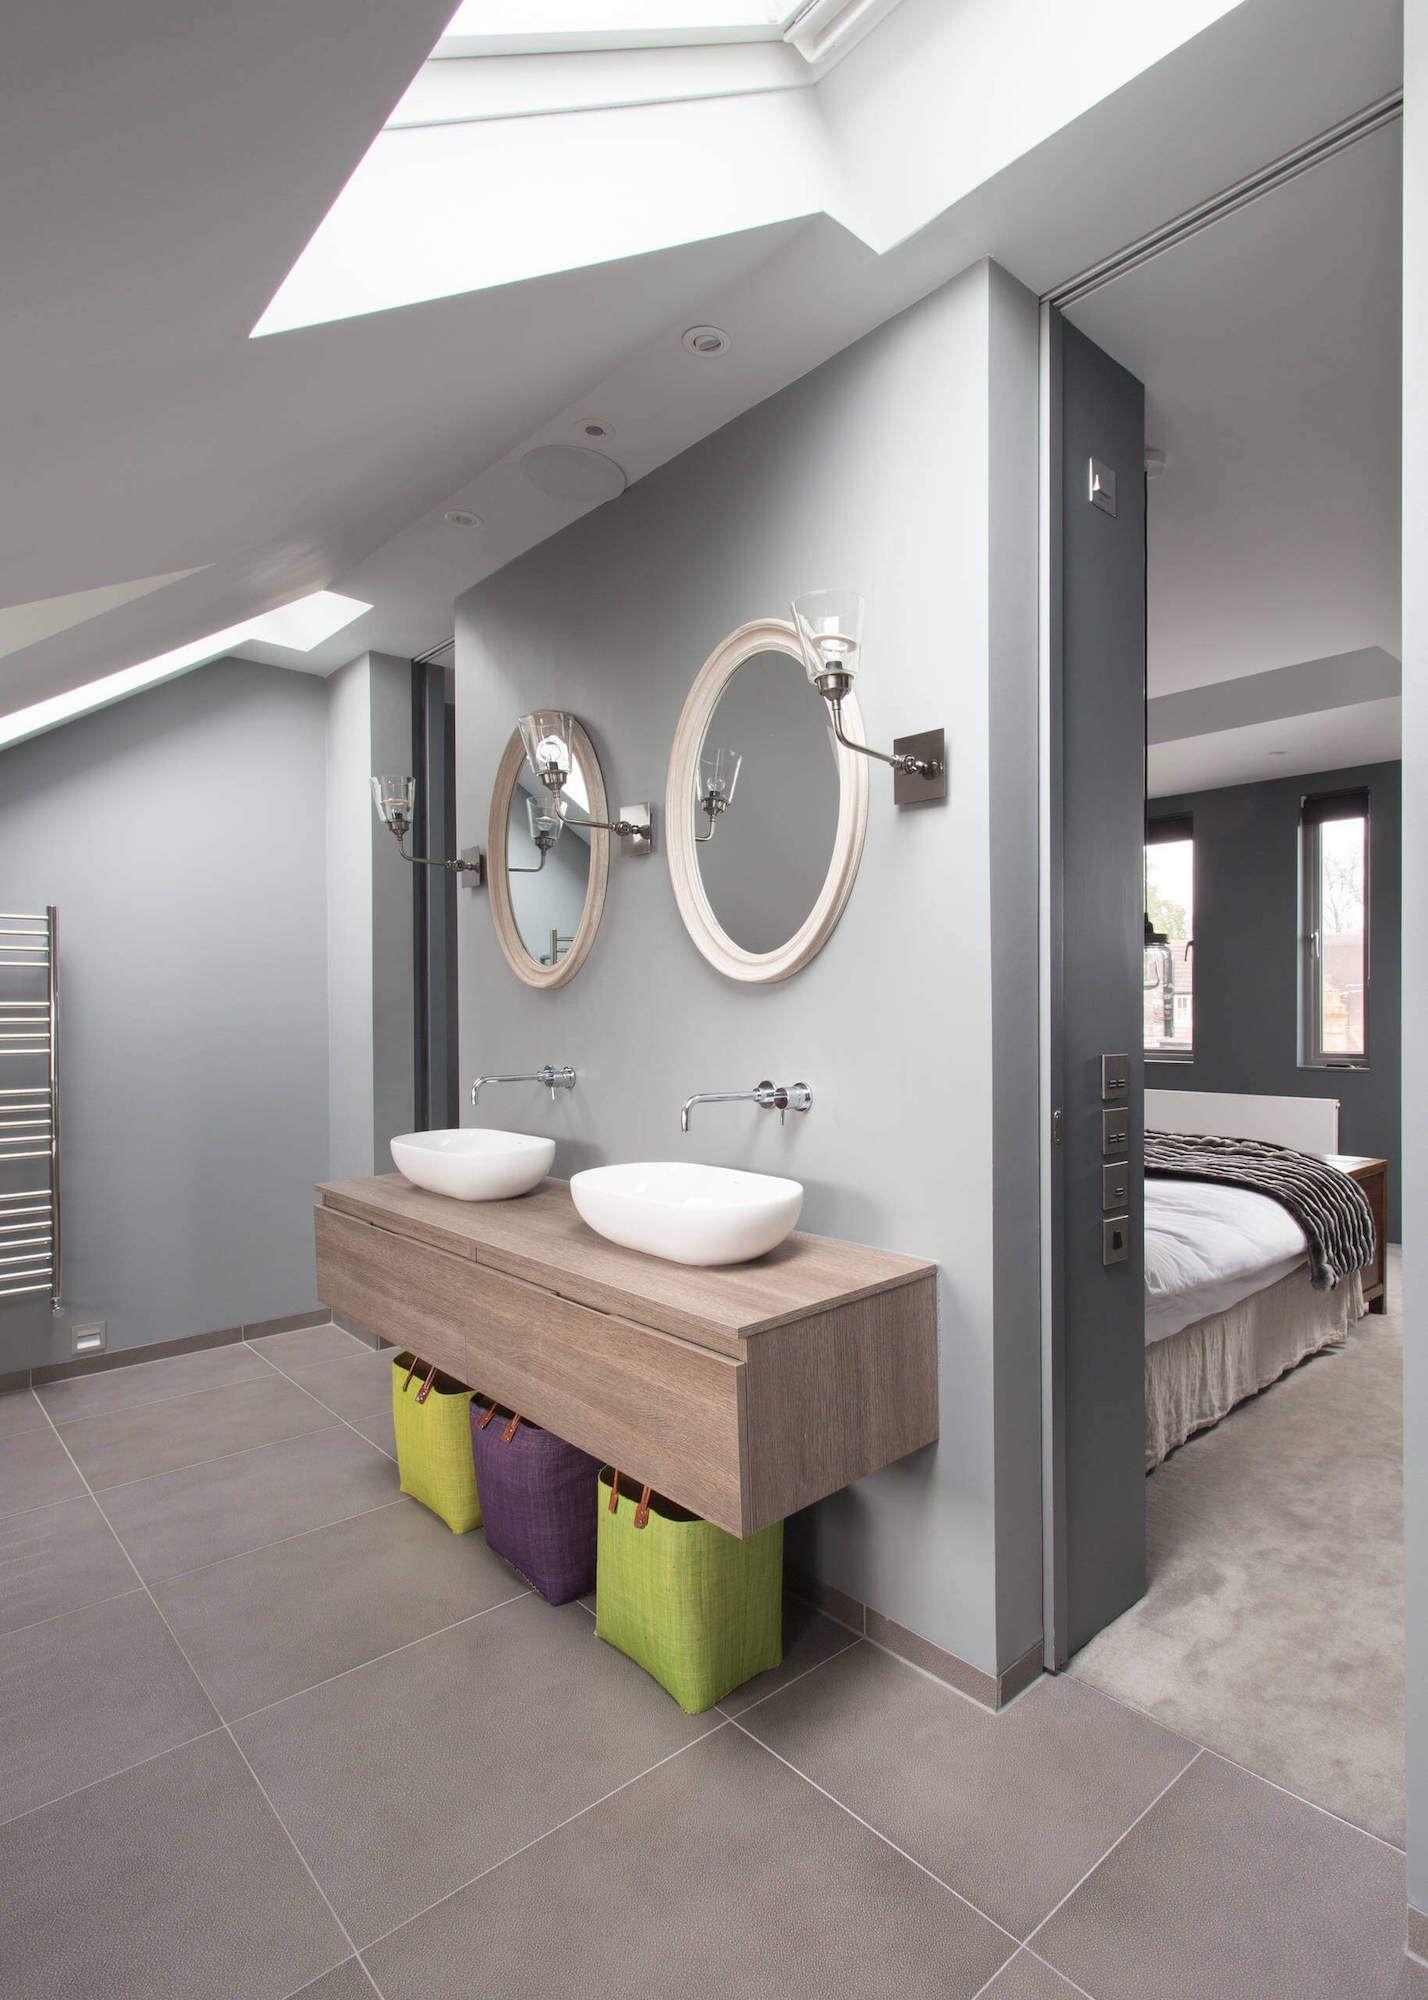 west-london-home-frenchstef-interior-design-06